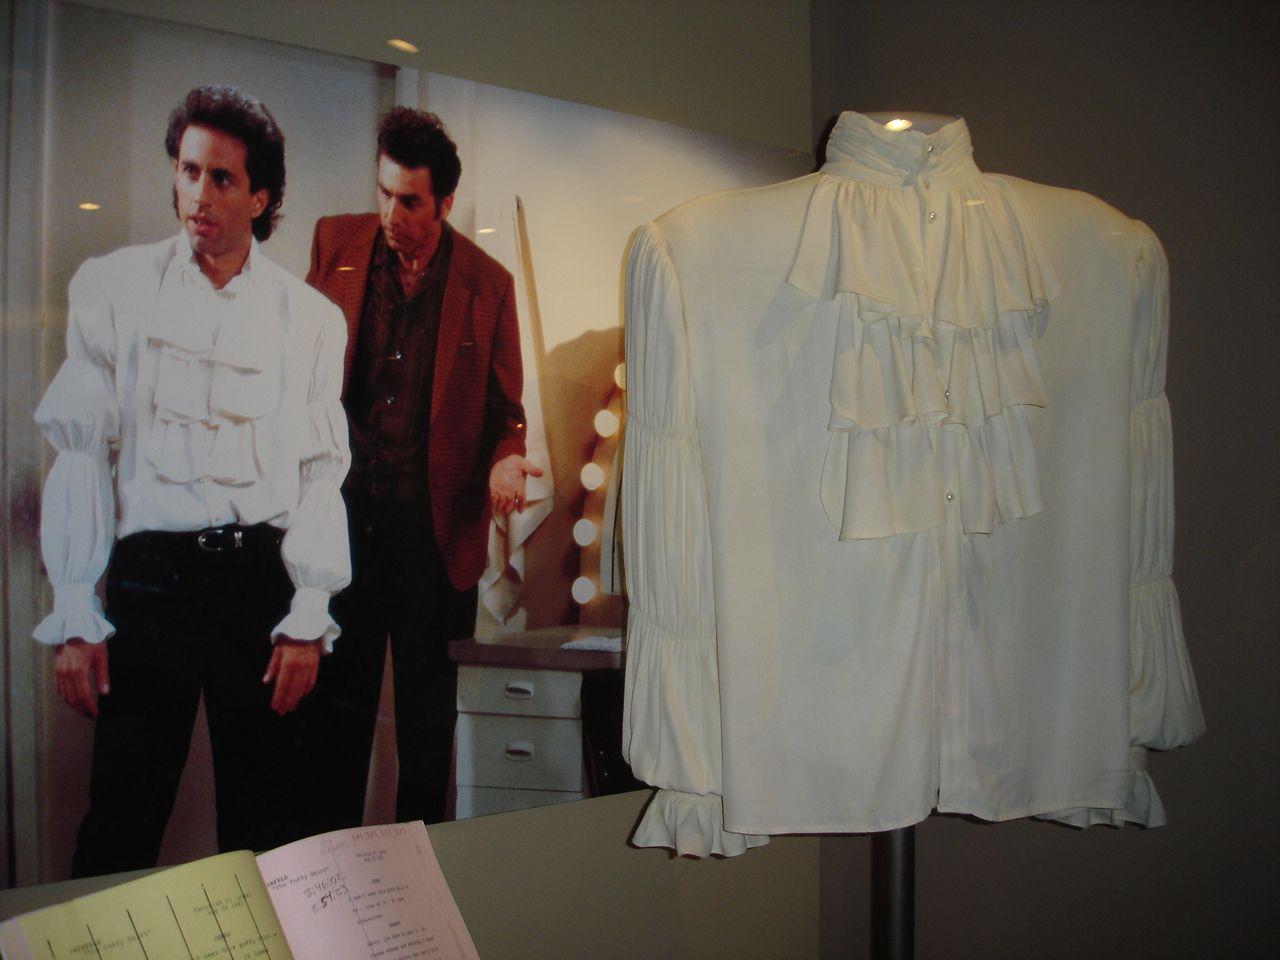 426ec4d7e1 Puffy Shirt 2006 - Blouse - Wikipedia